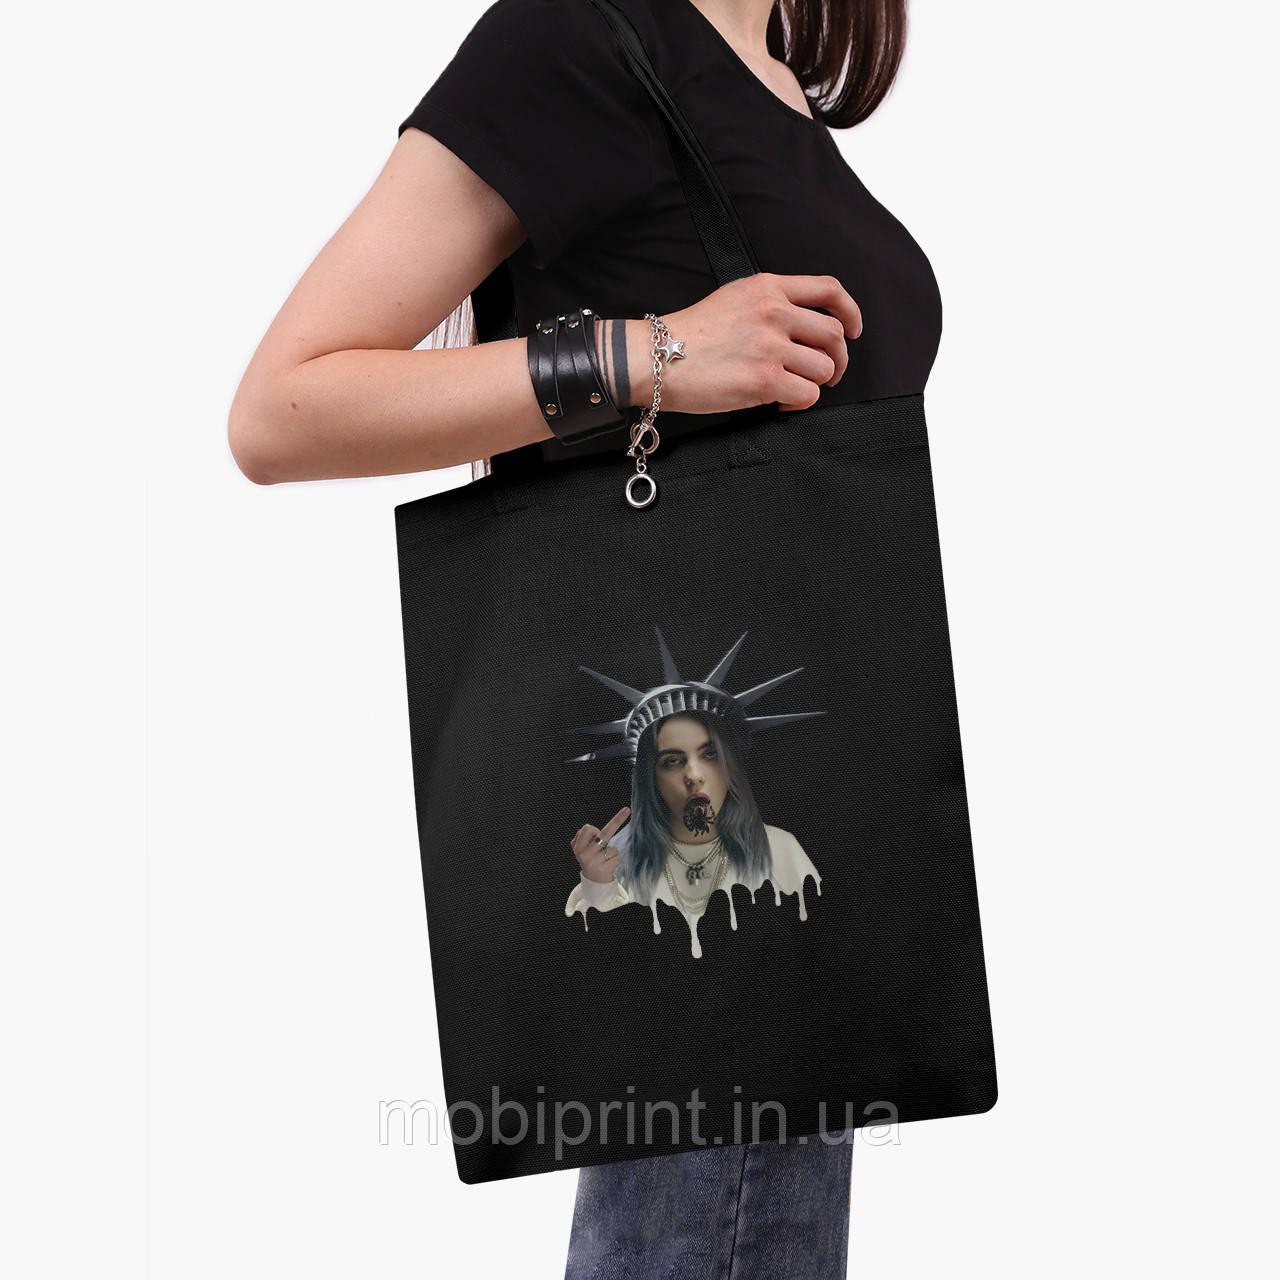 Еко сумка шоппер чорна Ренесанс-Біллі Айлиш (Billie Eilish) (9227-1583-2) экосумка шопер 41*35 см